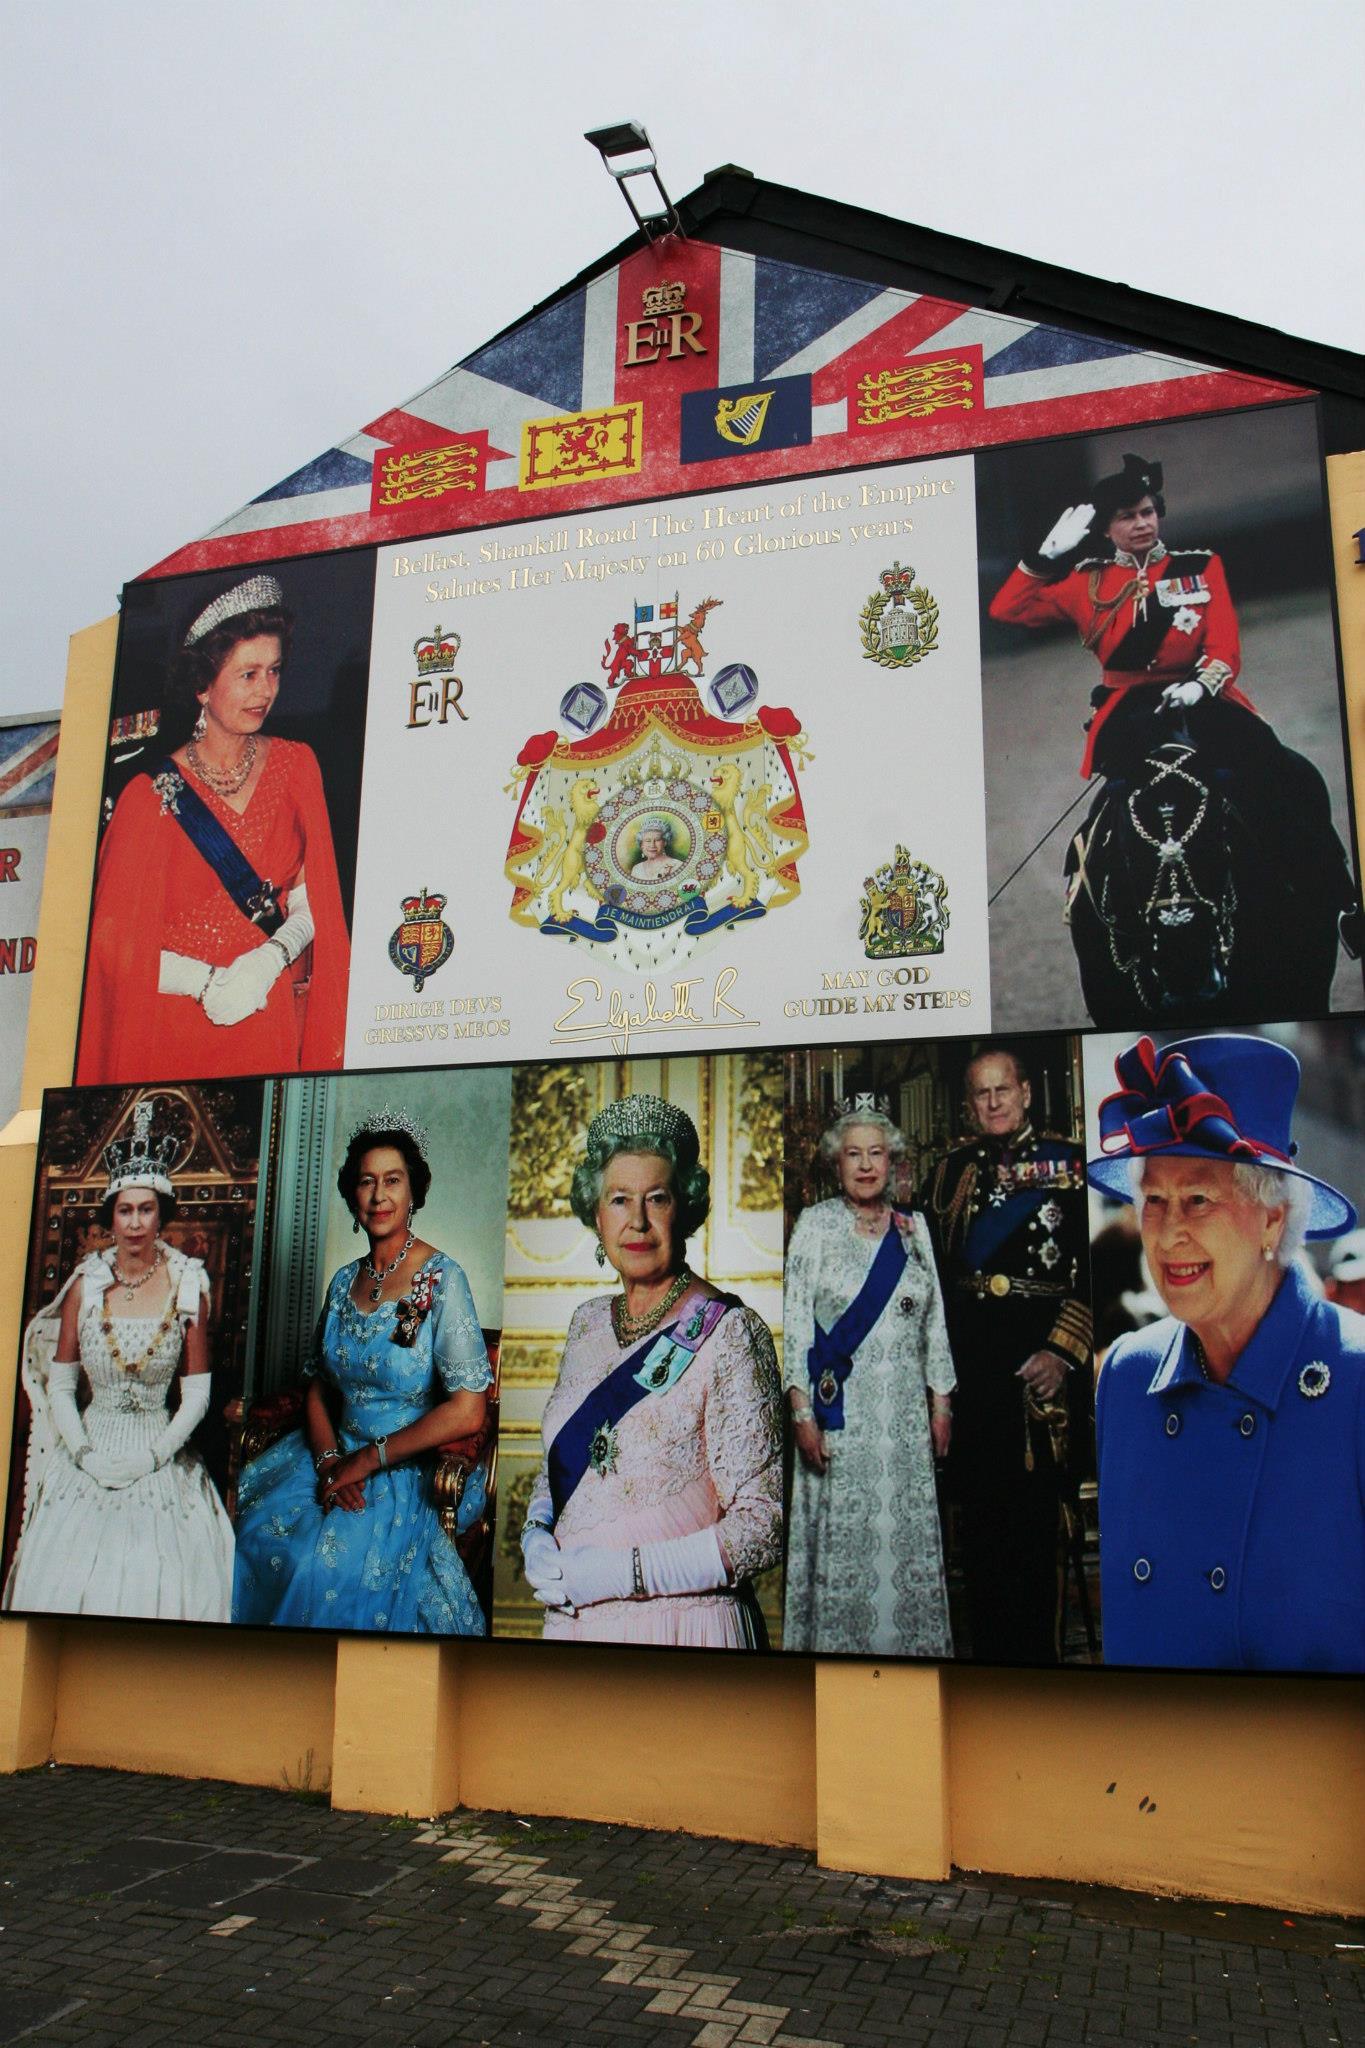 Protestantse muur vol prenten van koningin Elizabeth